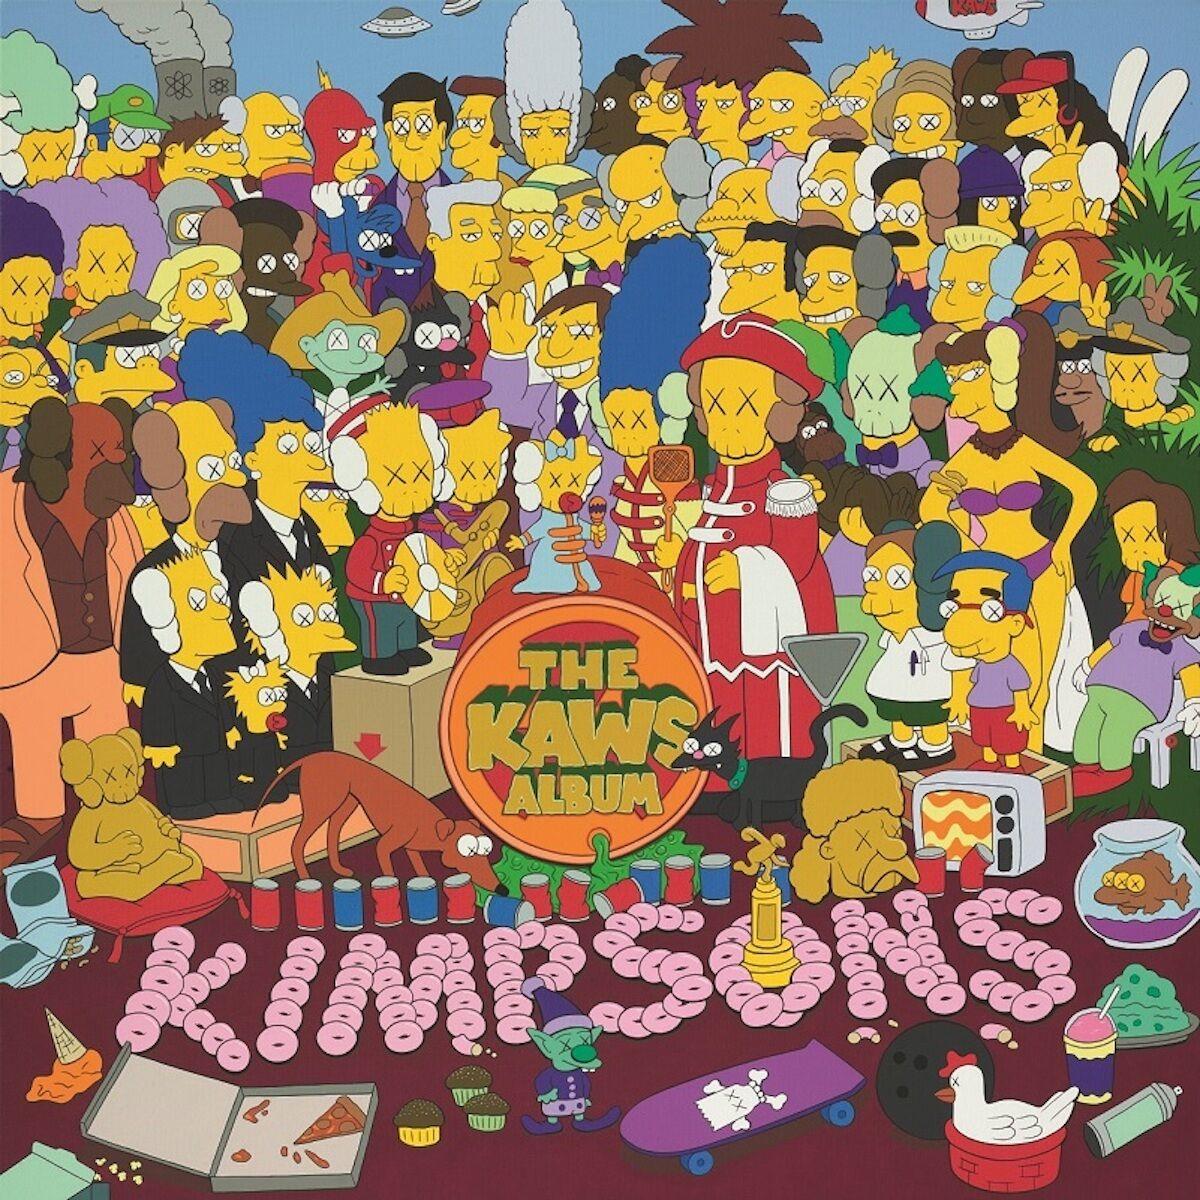 KAWS, The KAWS Album, 2005. Sold for $HK 116 million ($US 14.8 million). Courtesy Sotheby's.